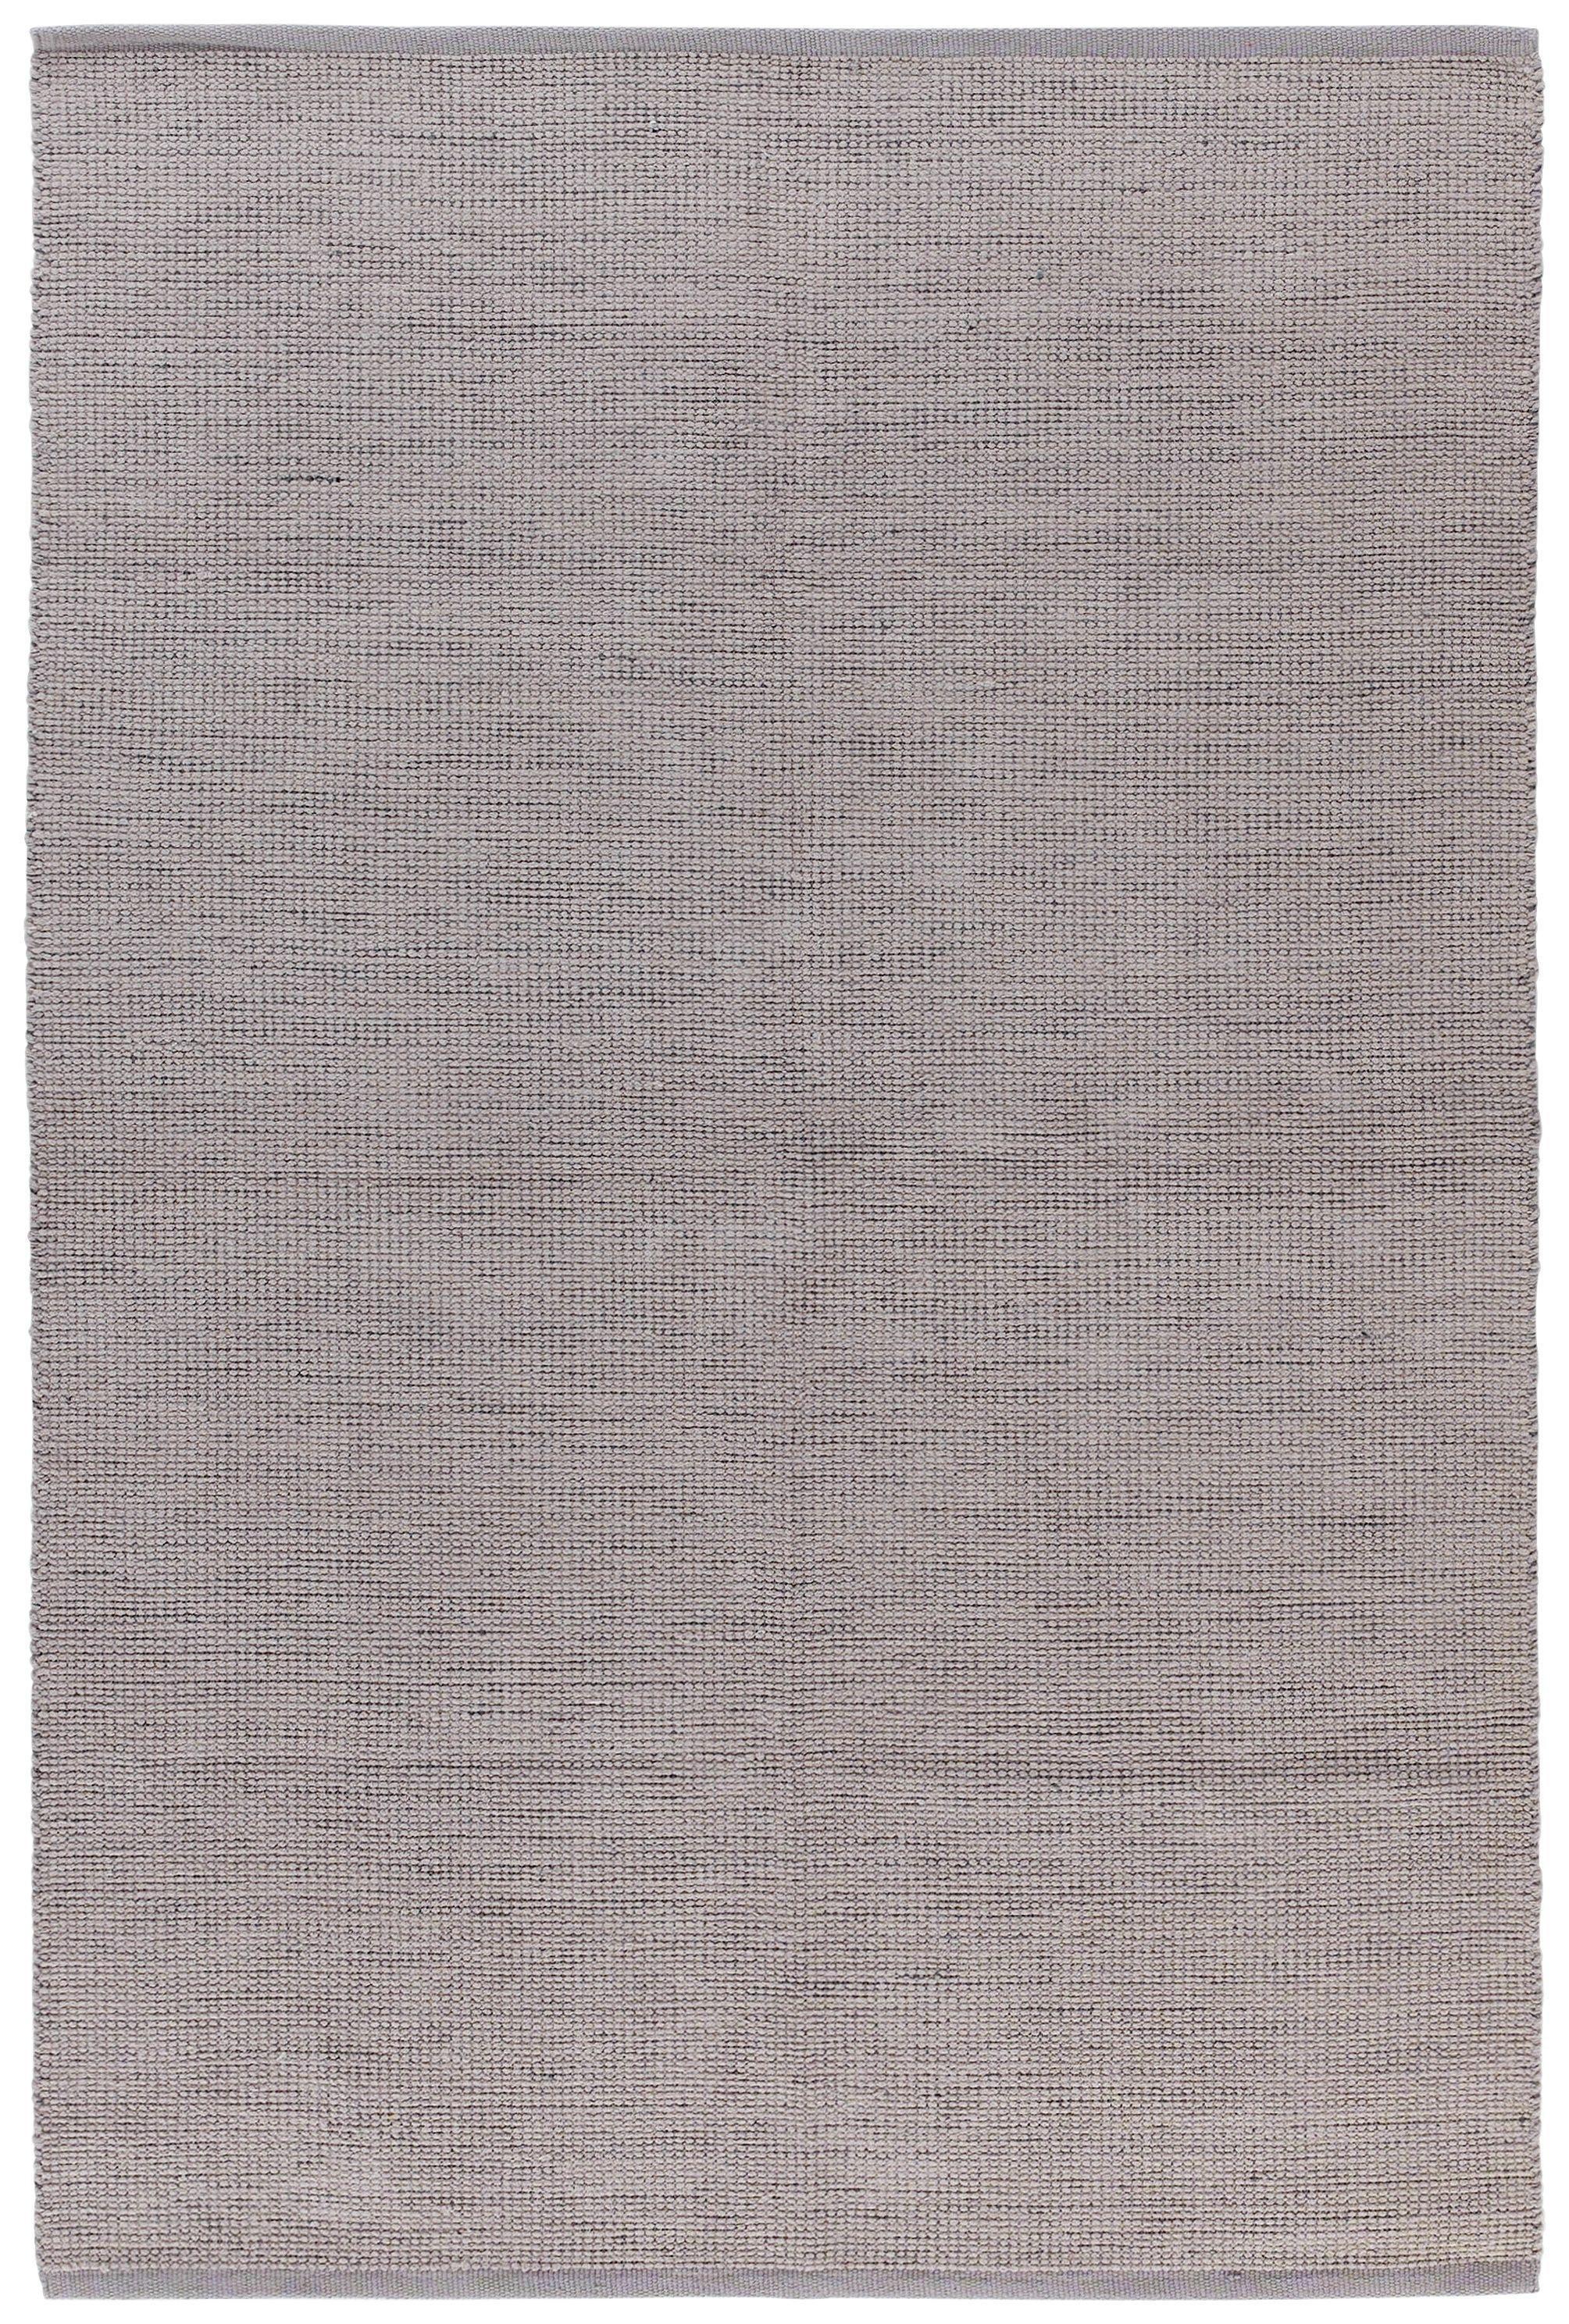 Habitat Ombre Rug   120x180cm   Grey